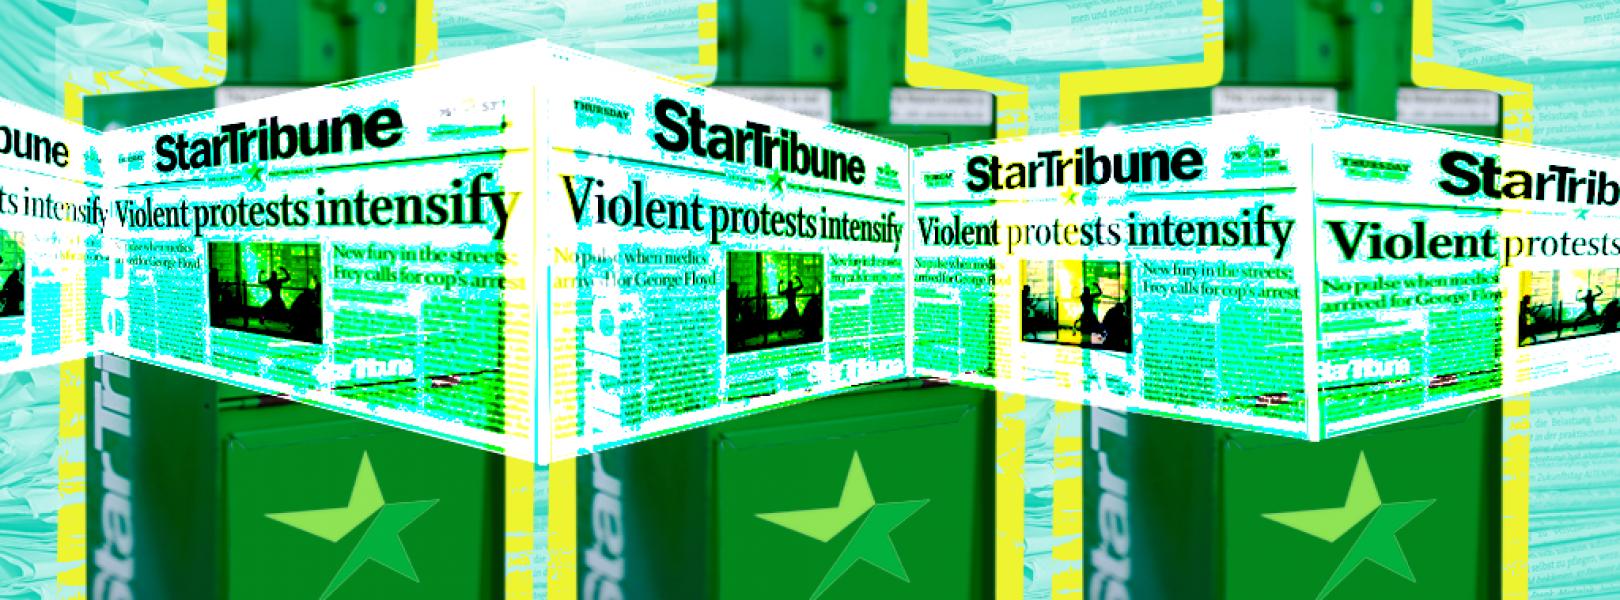 Star Tribune print headlines